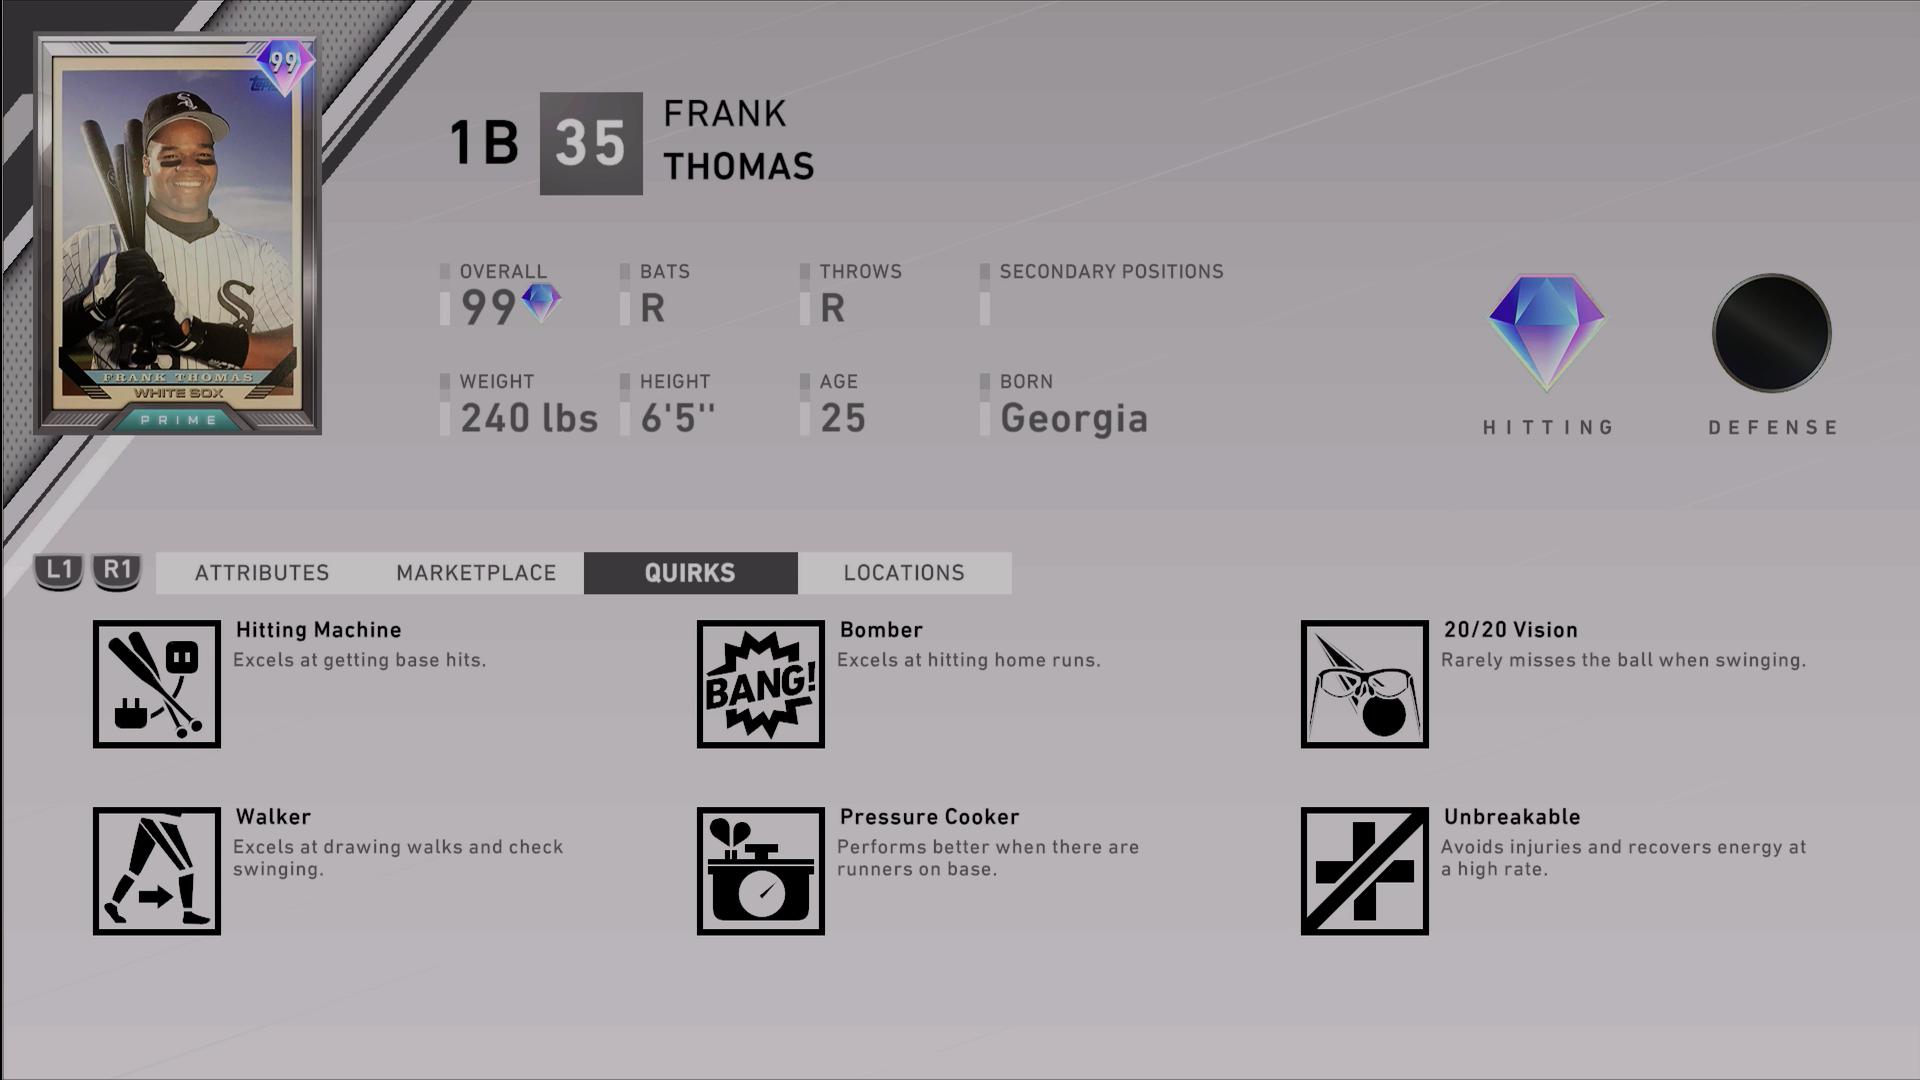 mlb-the-show-20-7th-inning-program-prime-frank-thomas-quirks